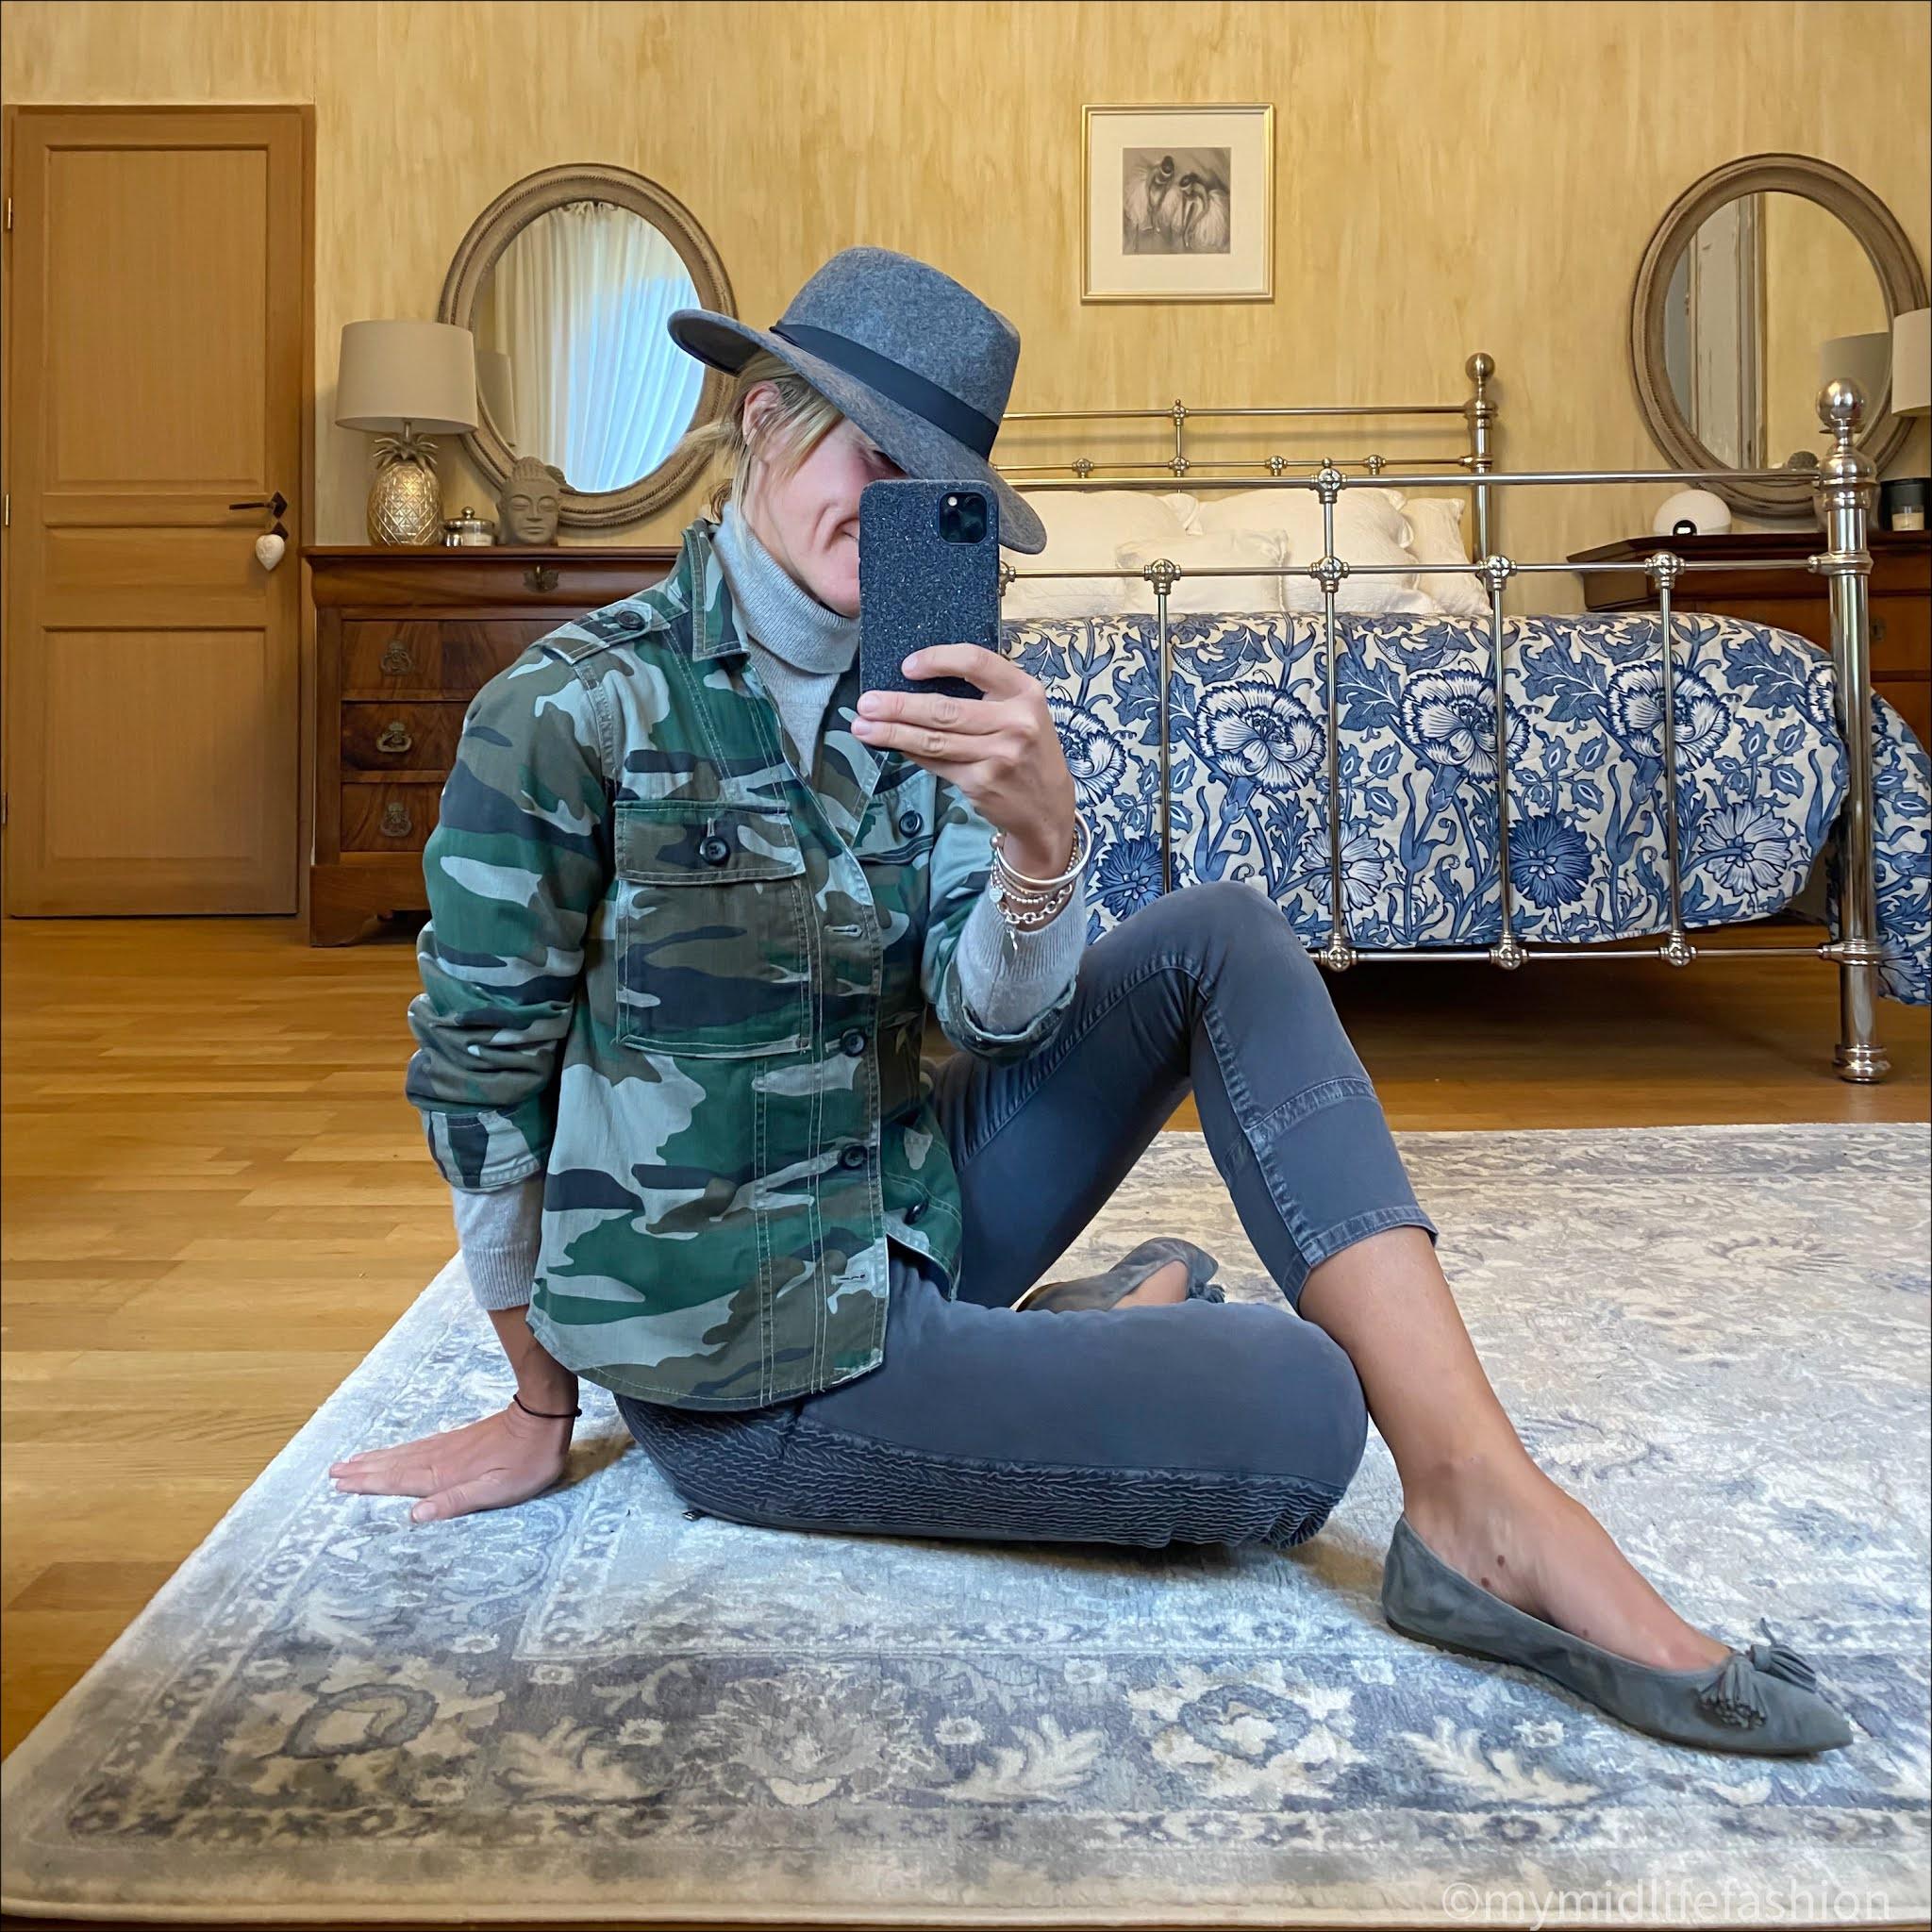 my midlife fashion, zara felt fedora hat, marks and Spencer pure cashmere roll neck jumper, j crew camouflage overshirt, Isabel Marant Etoile biker jeans, j crew suede tassel ballet flats